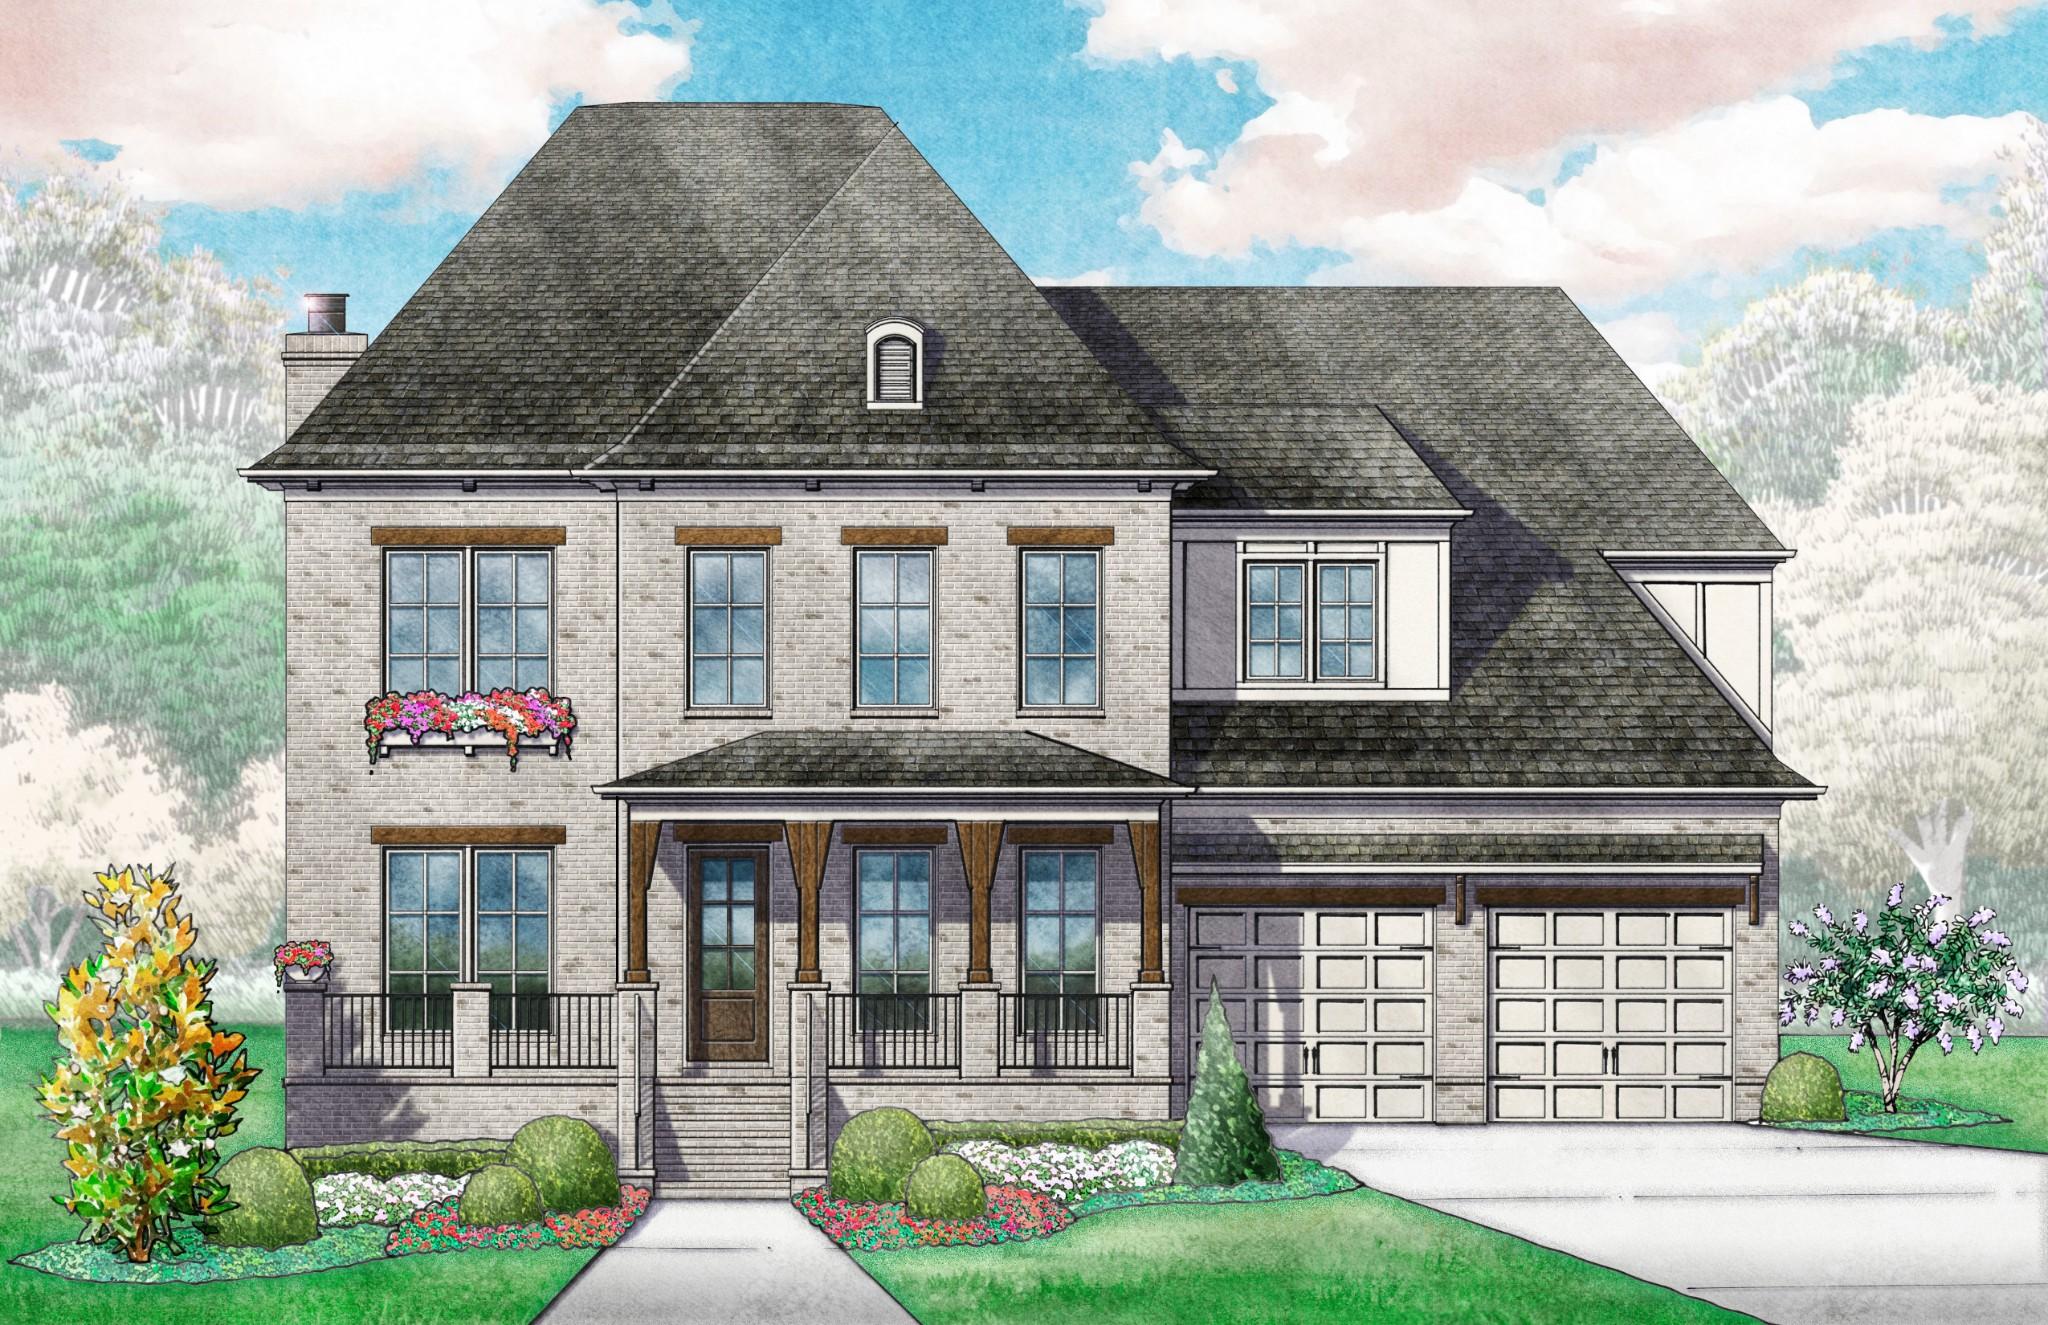 913 Cheltenham Ave, Lot # 2142 Property Photo - Franklin, TN real estate listing